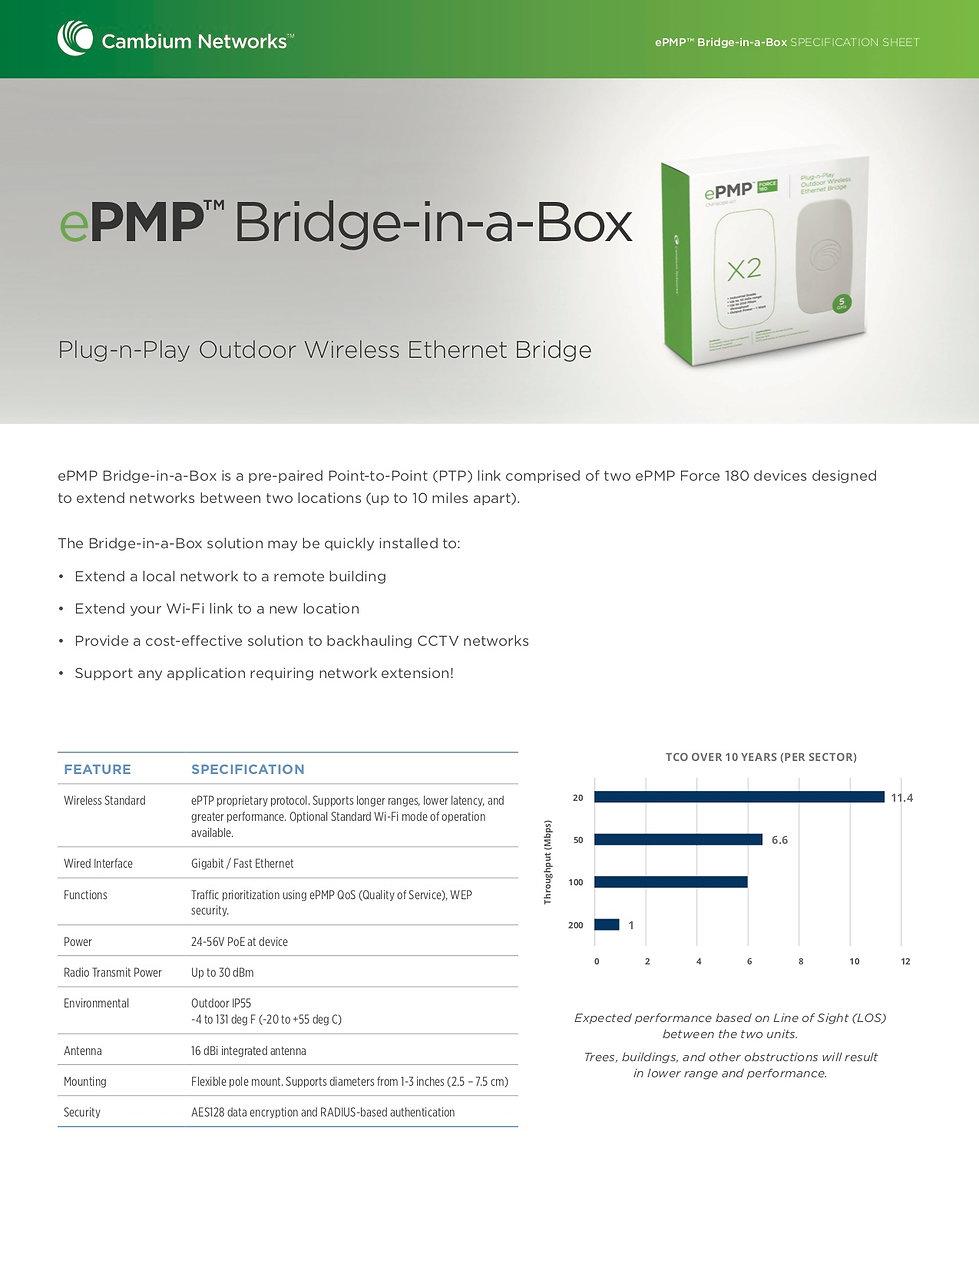 CambiumBridge-in-a-box Specification